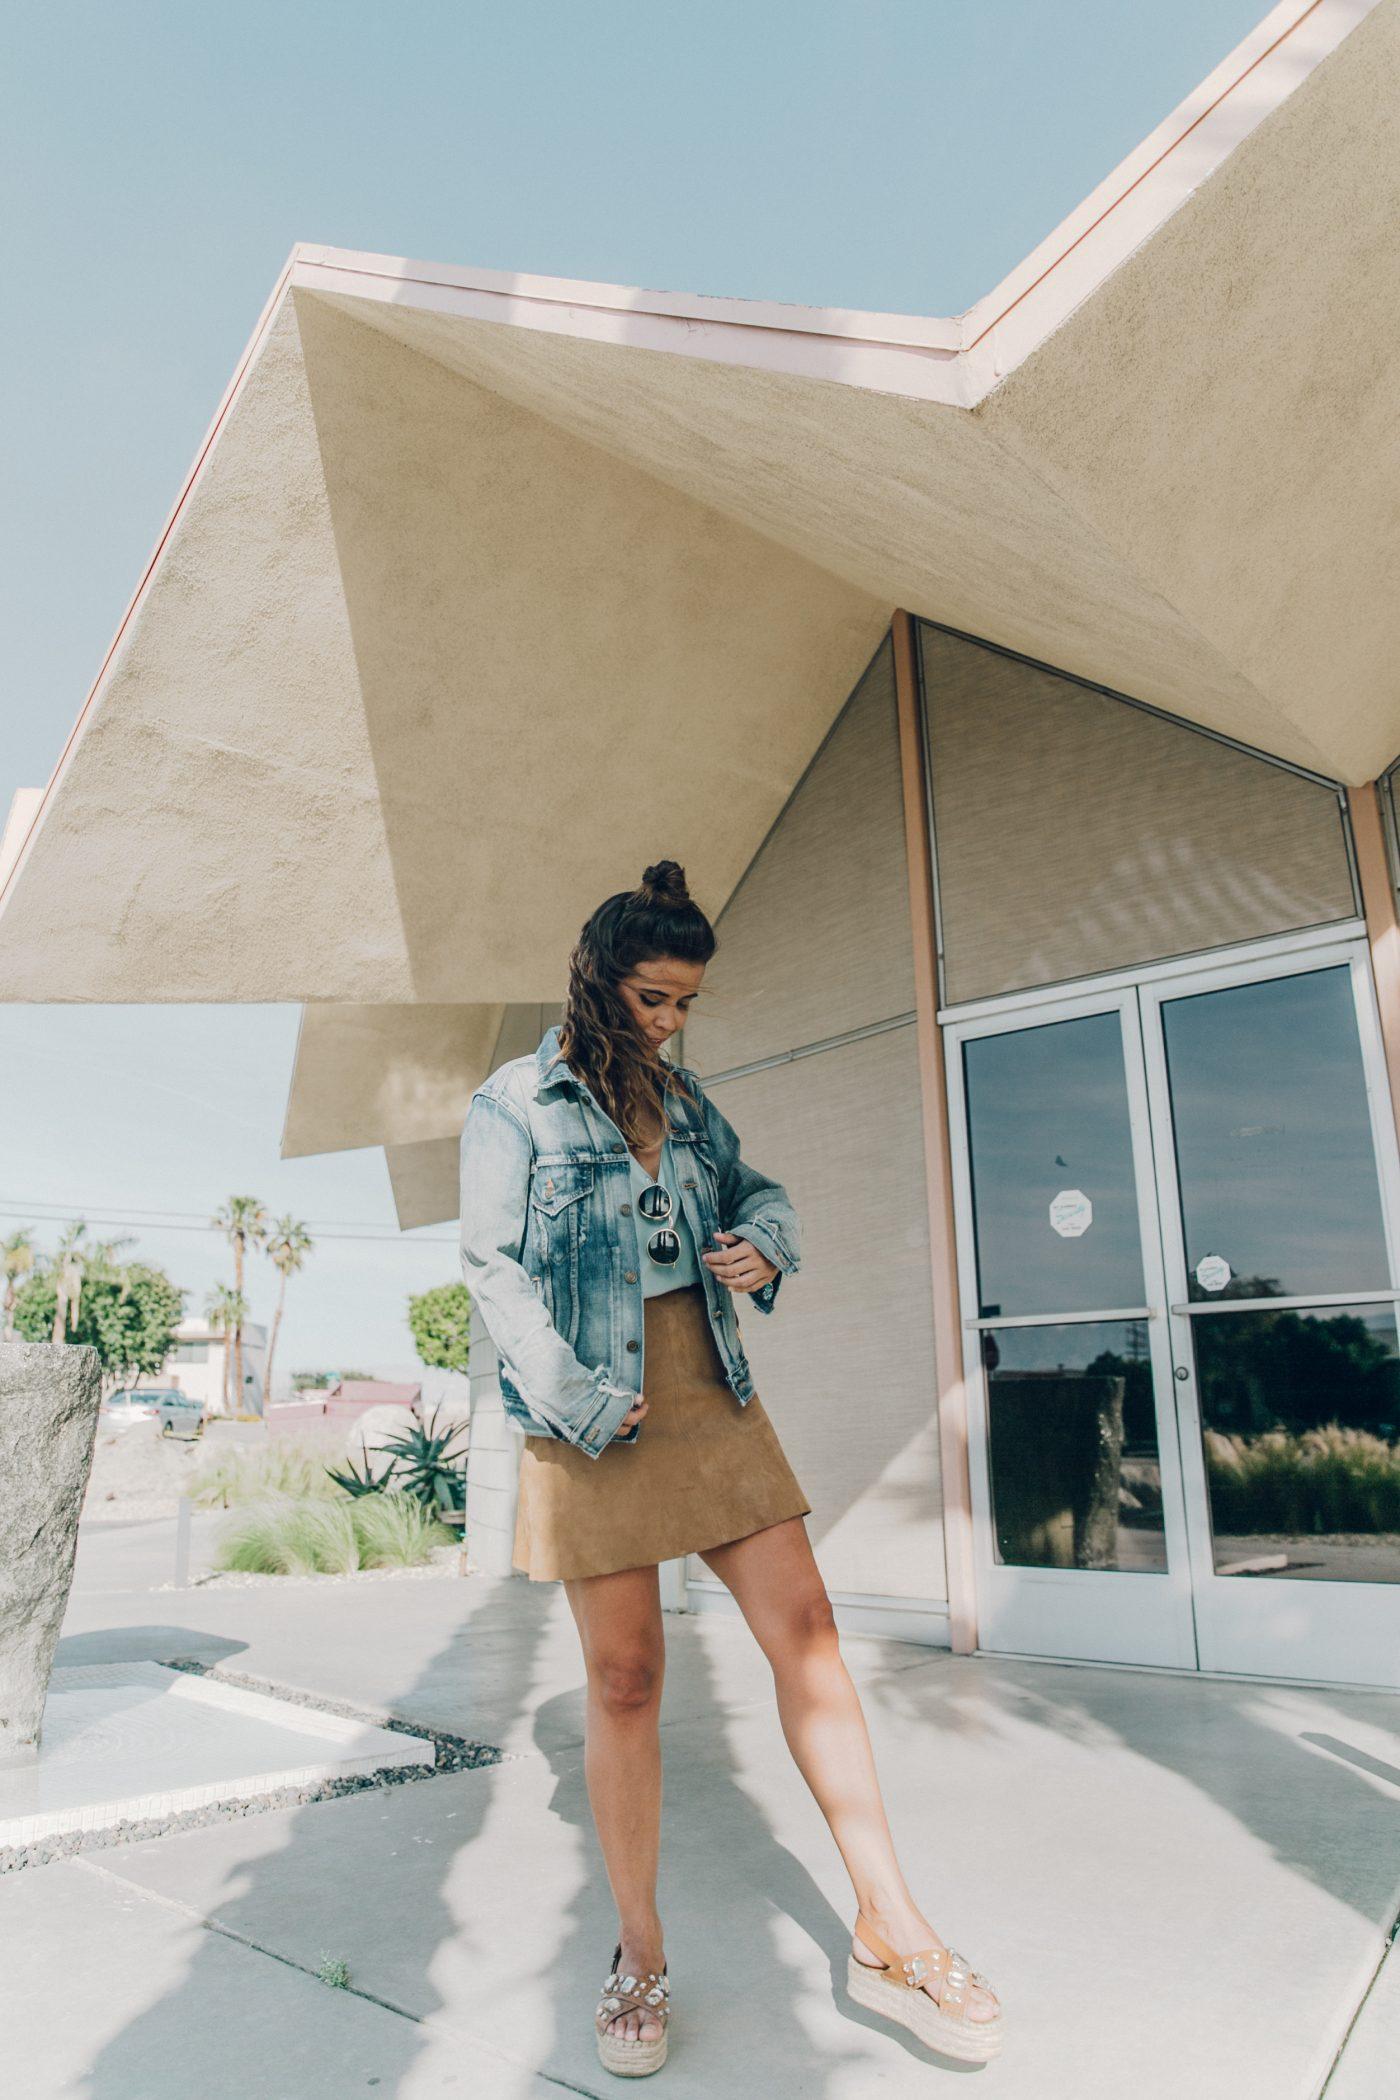 Denim_Jacket-Saint_Laurent-Chloe_Top-Suede_Skirt-Chloe_Hudson_Bag-Espadrilles-Coachella-Palm_Springs-Outfit-Collage_Vintage-9